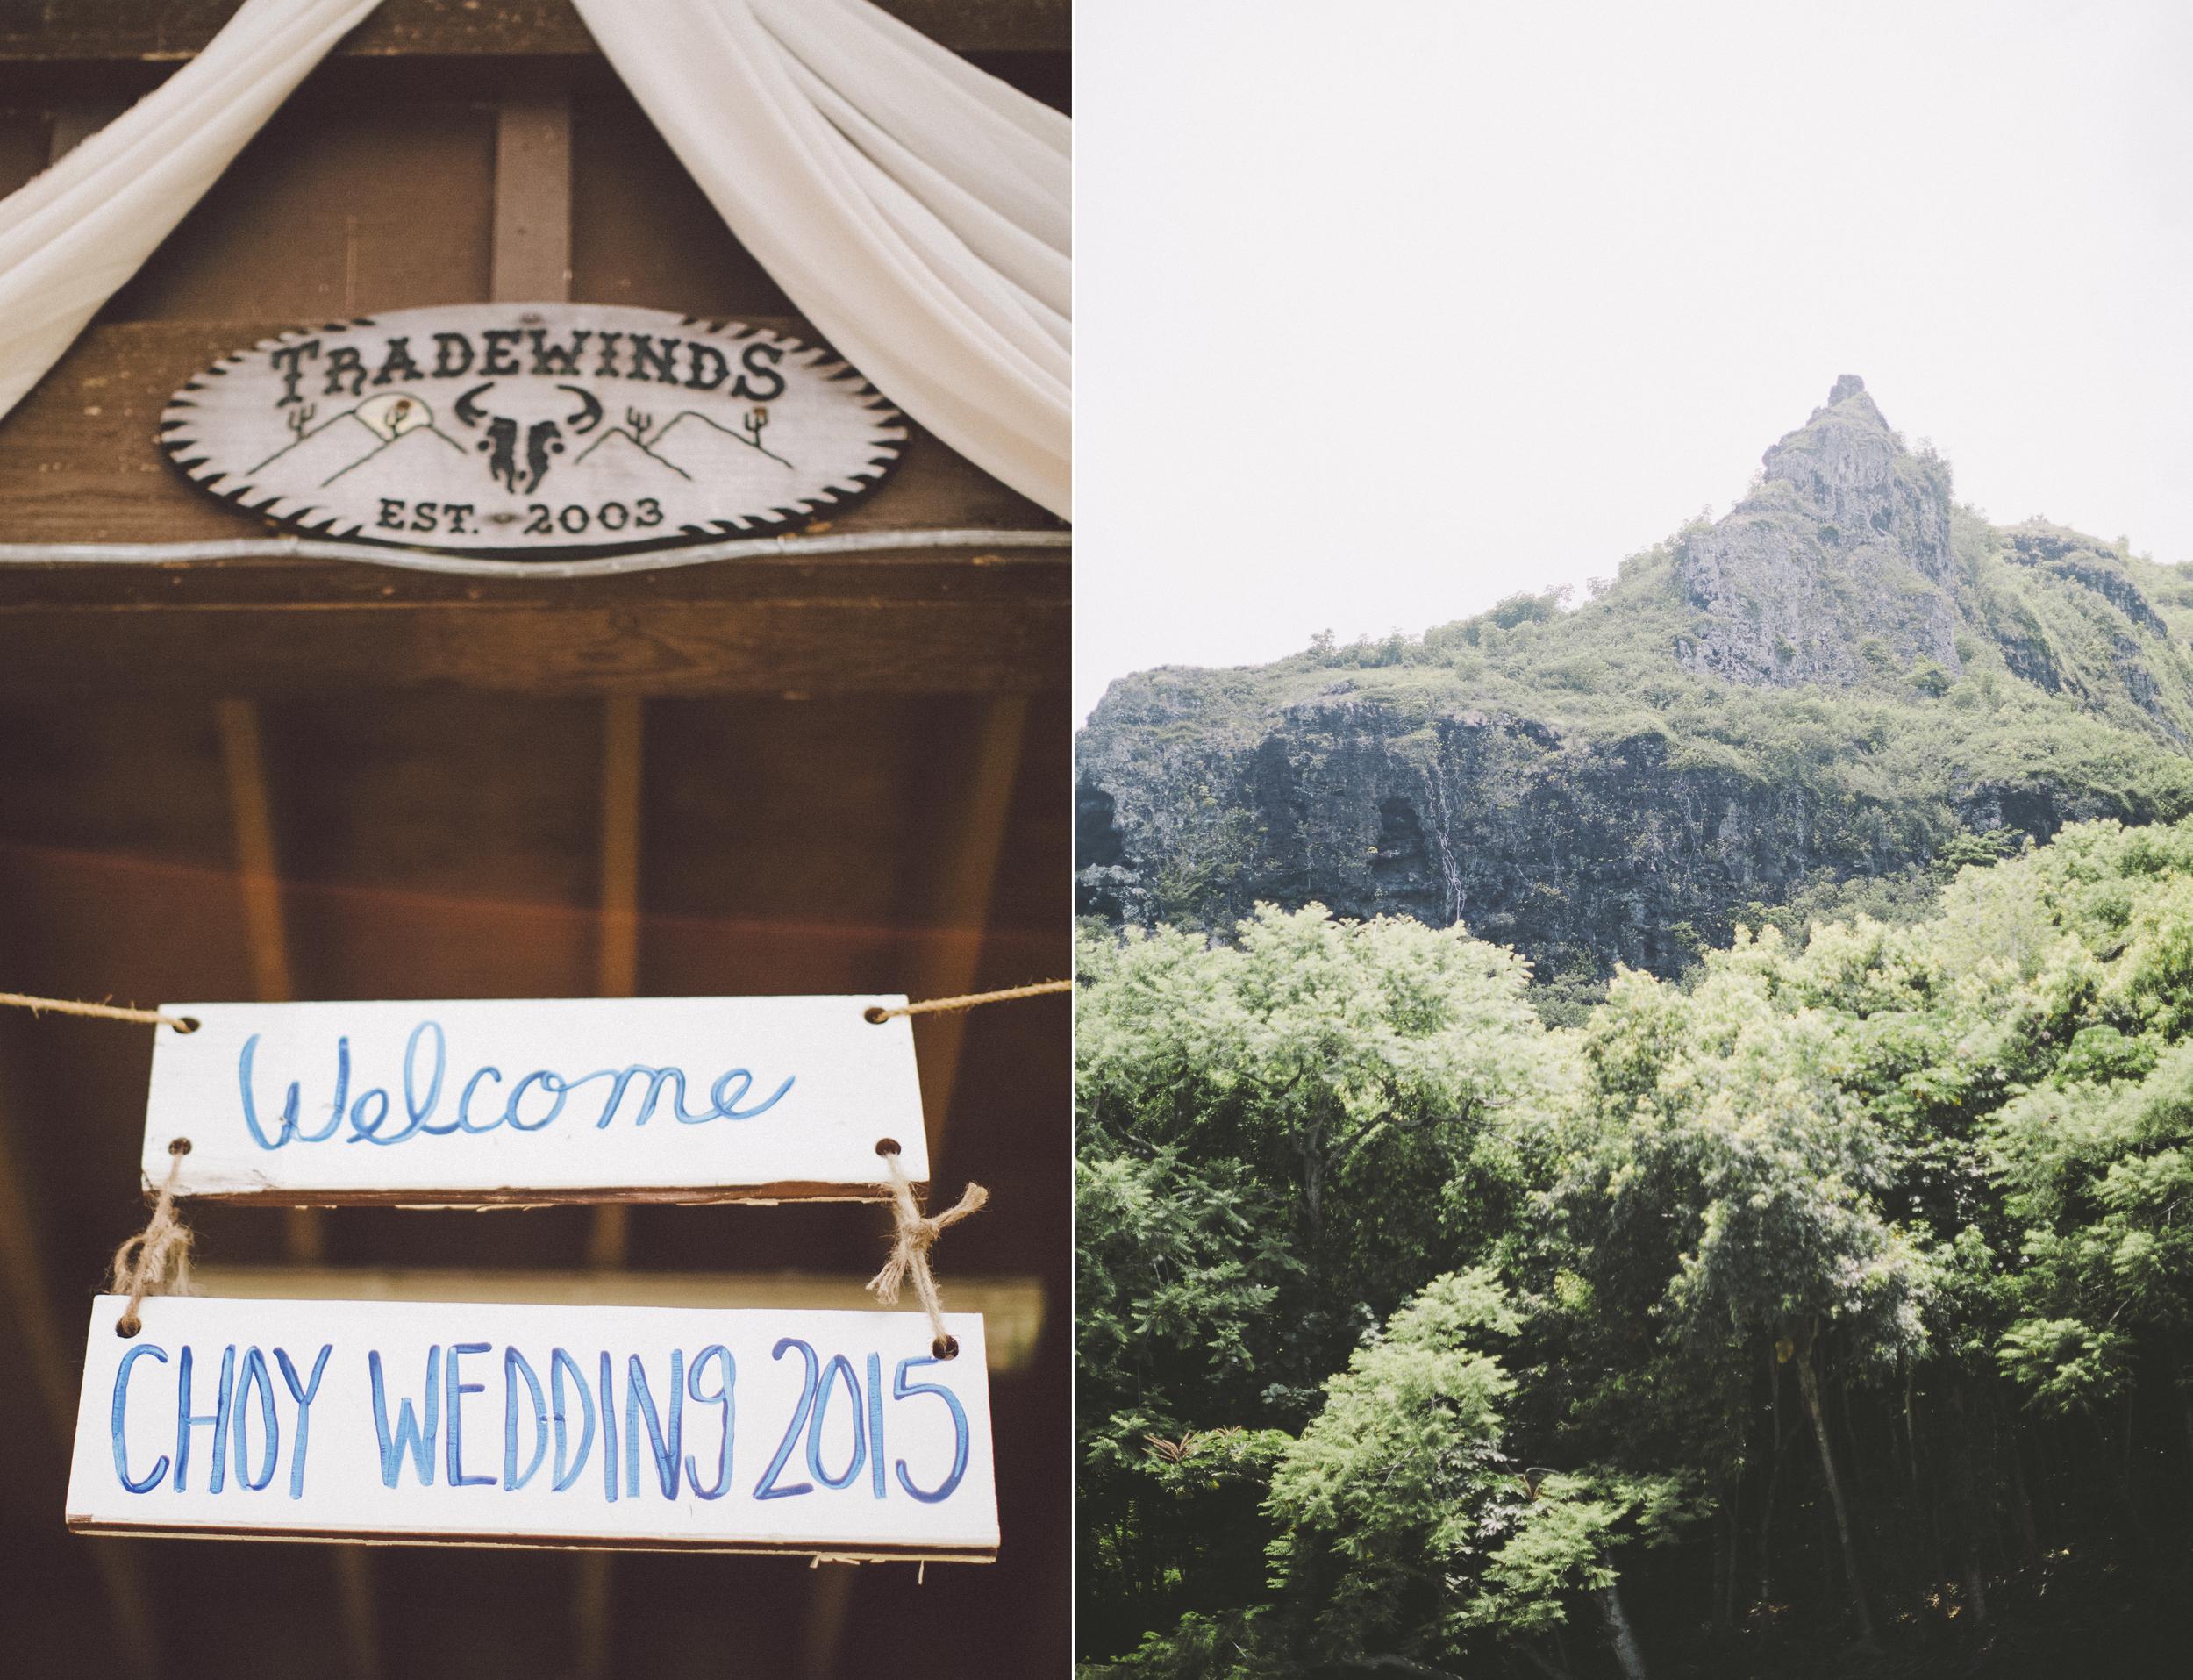 angie-diaz-photography-oahu-hawaii-wedding-tradewinds-ranch-02.jpg